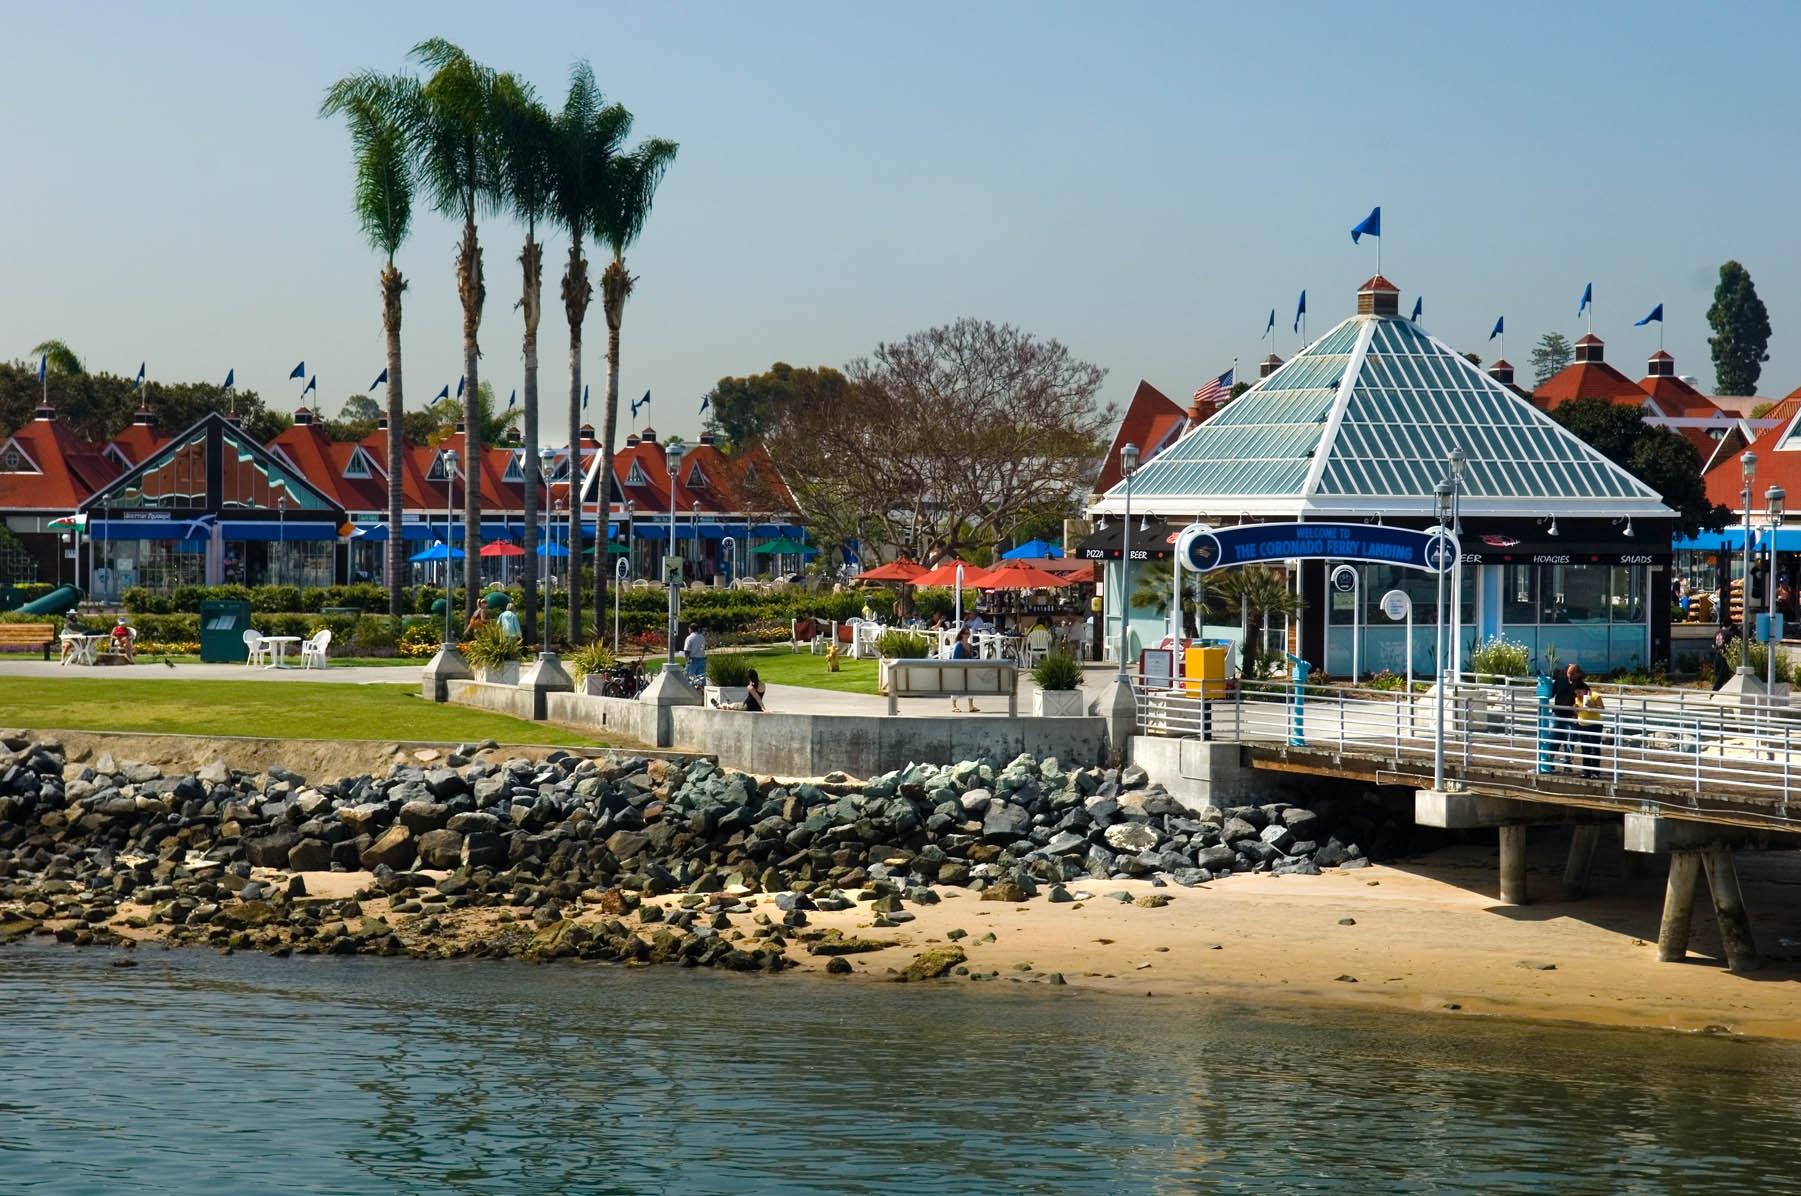 Coronado Ferry Landing Shops Bayside San Diego Travel Blog